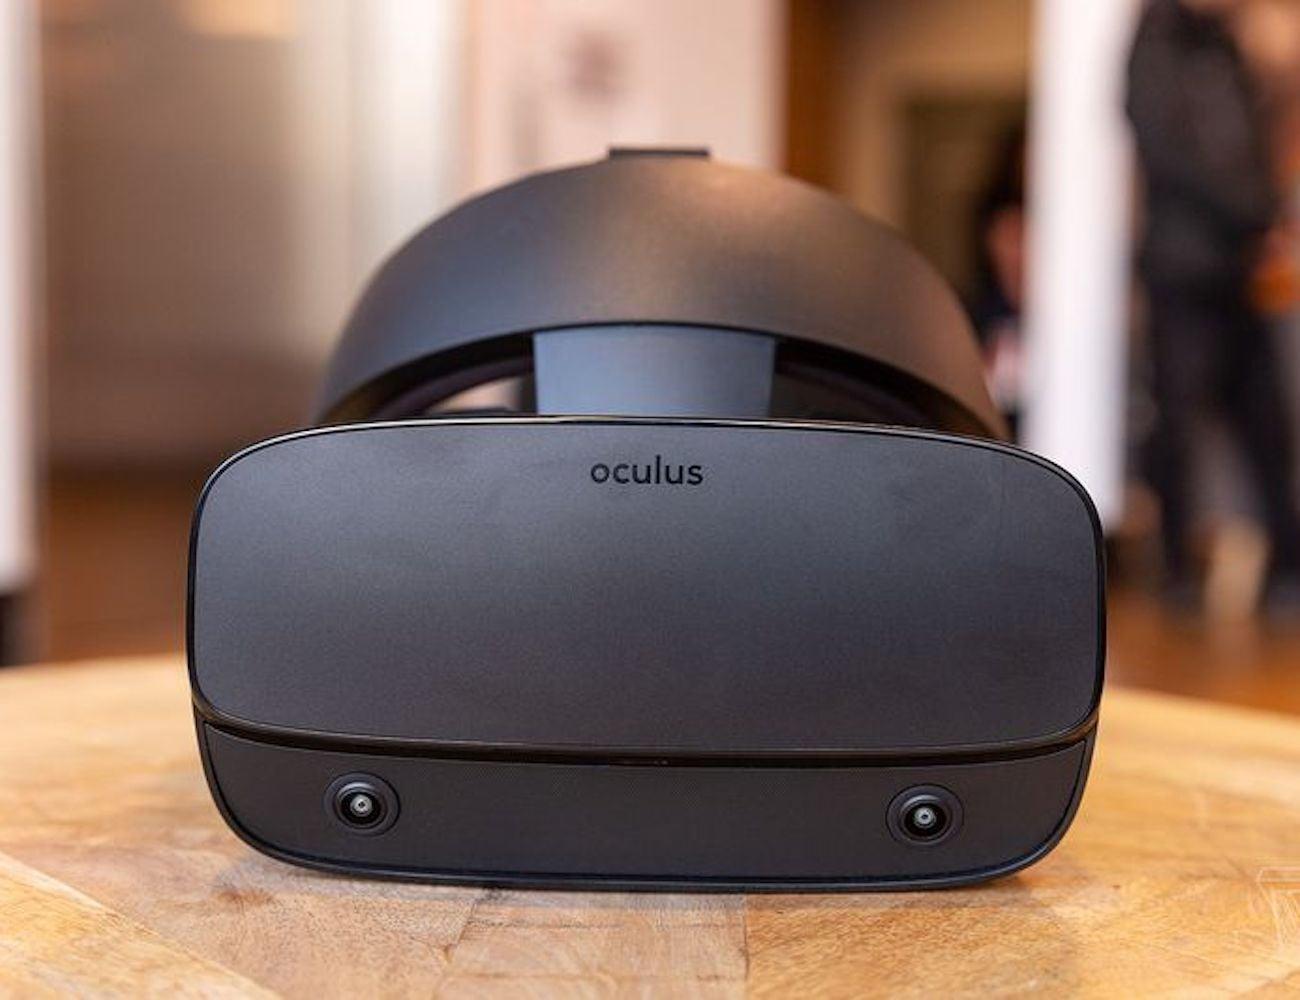 Oculus Rift VorauГџetzungen